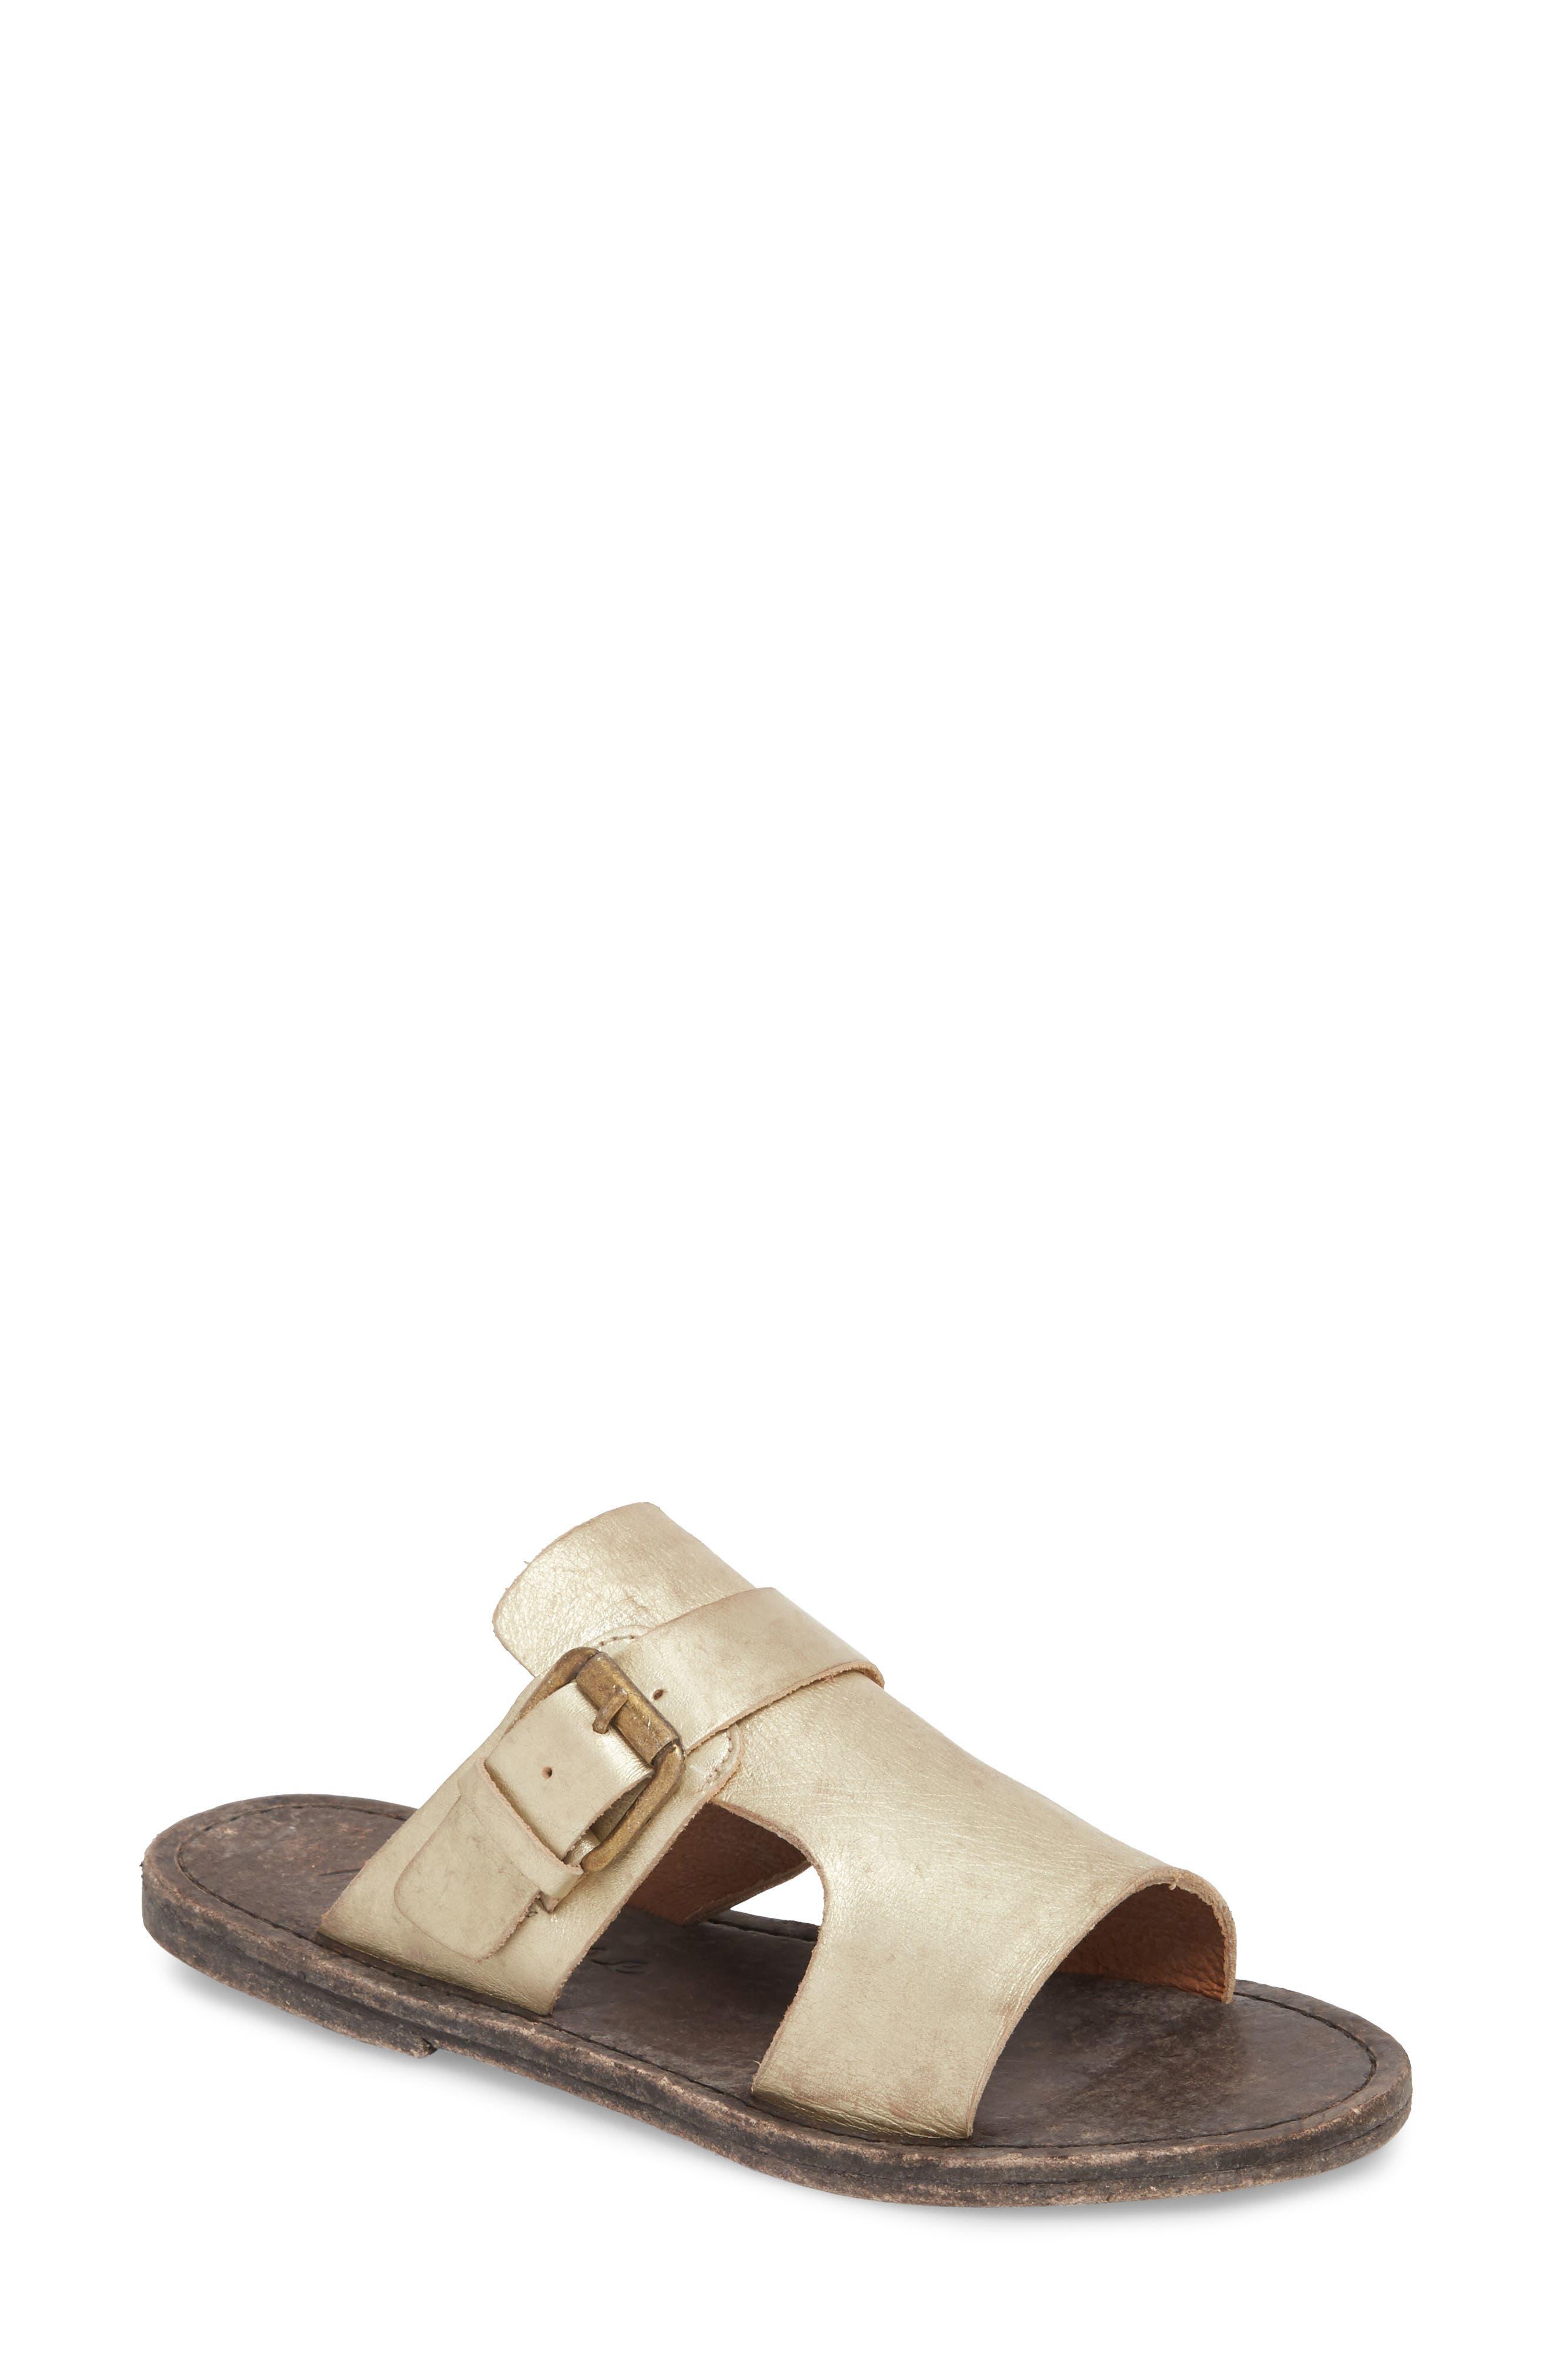 Abbie Slide Sandal,                         Main,                         color, Gold Leather